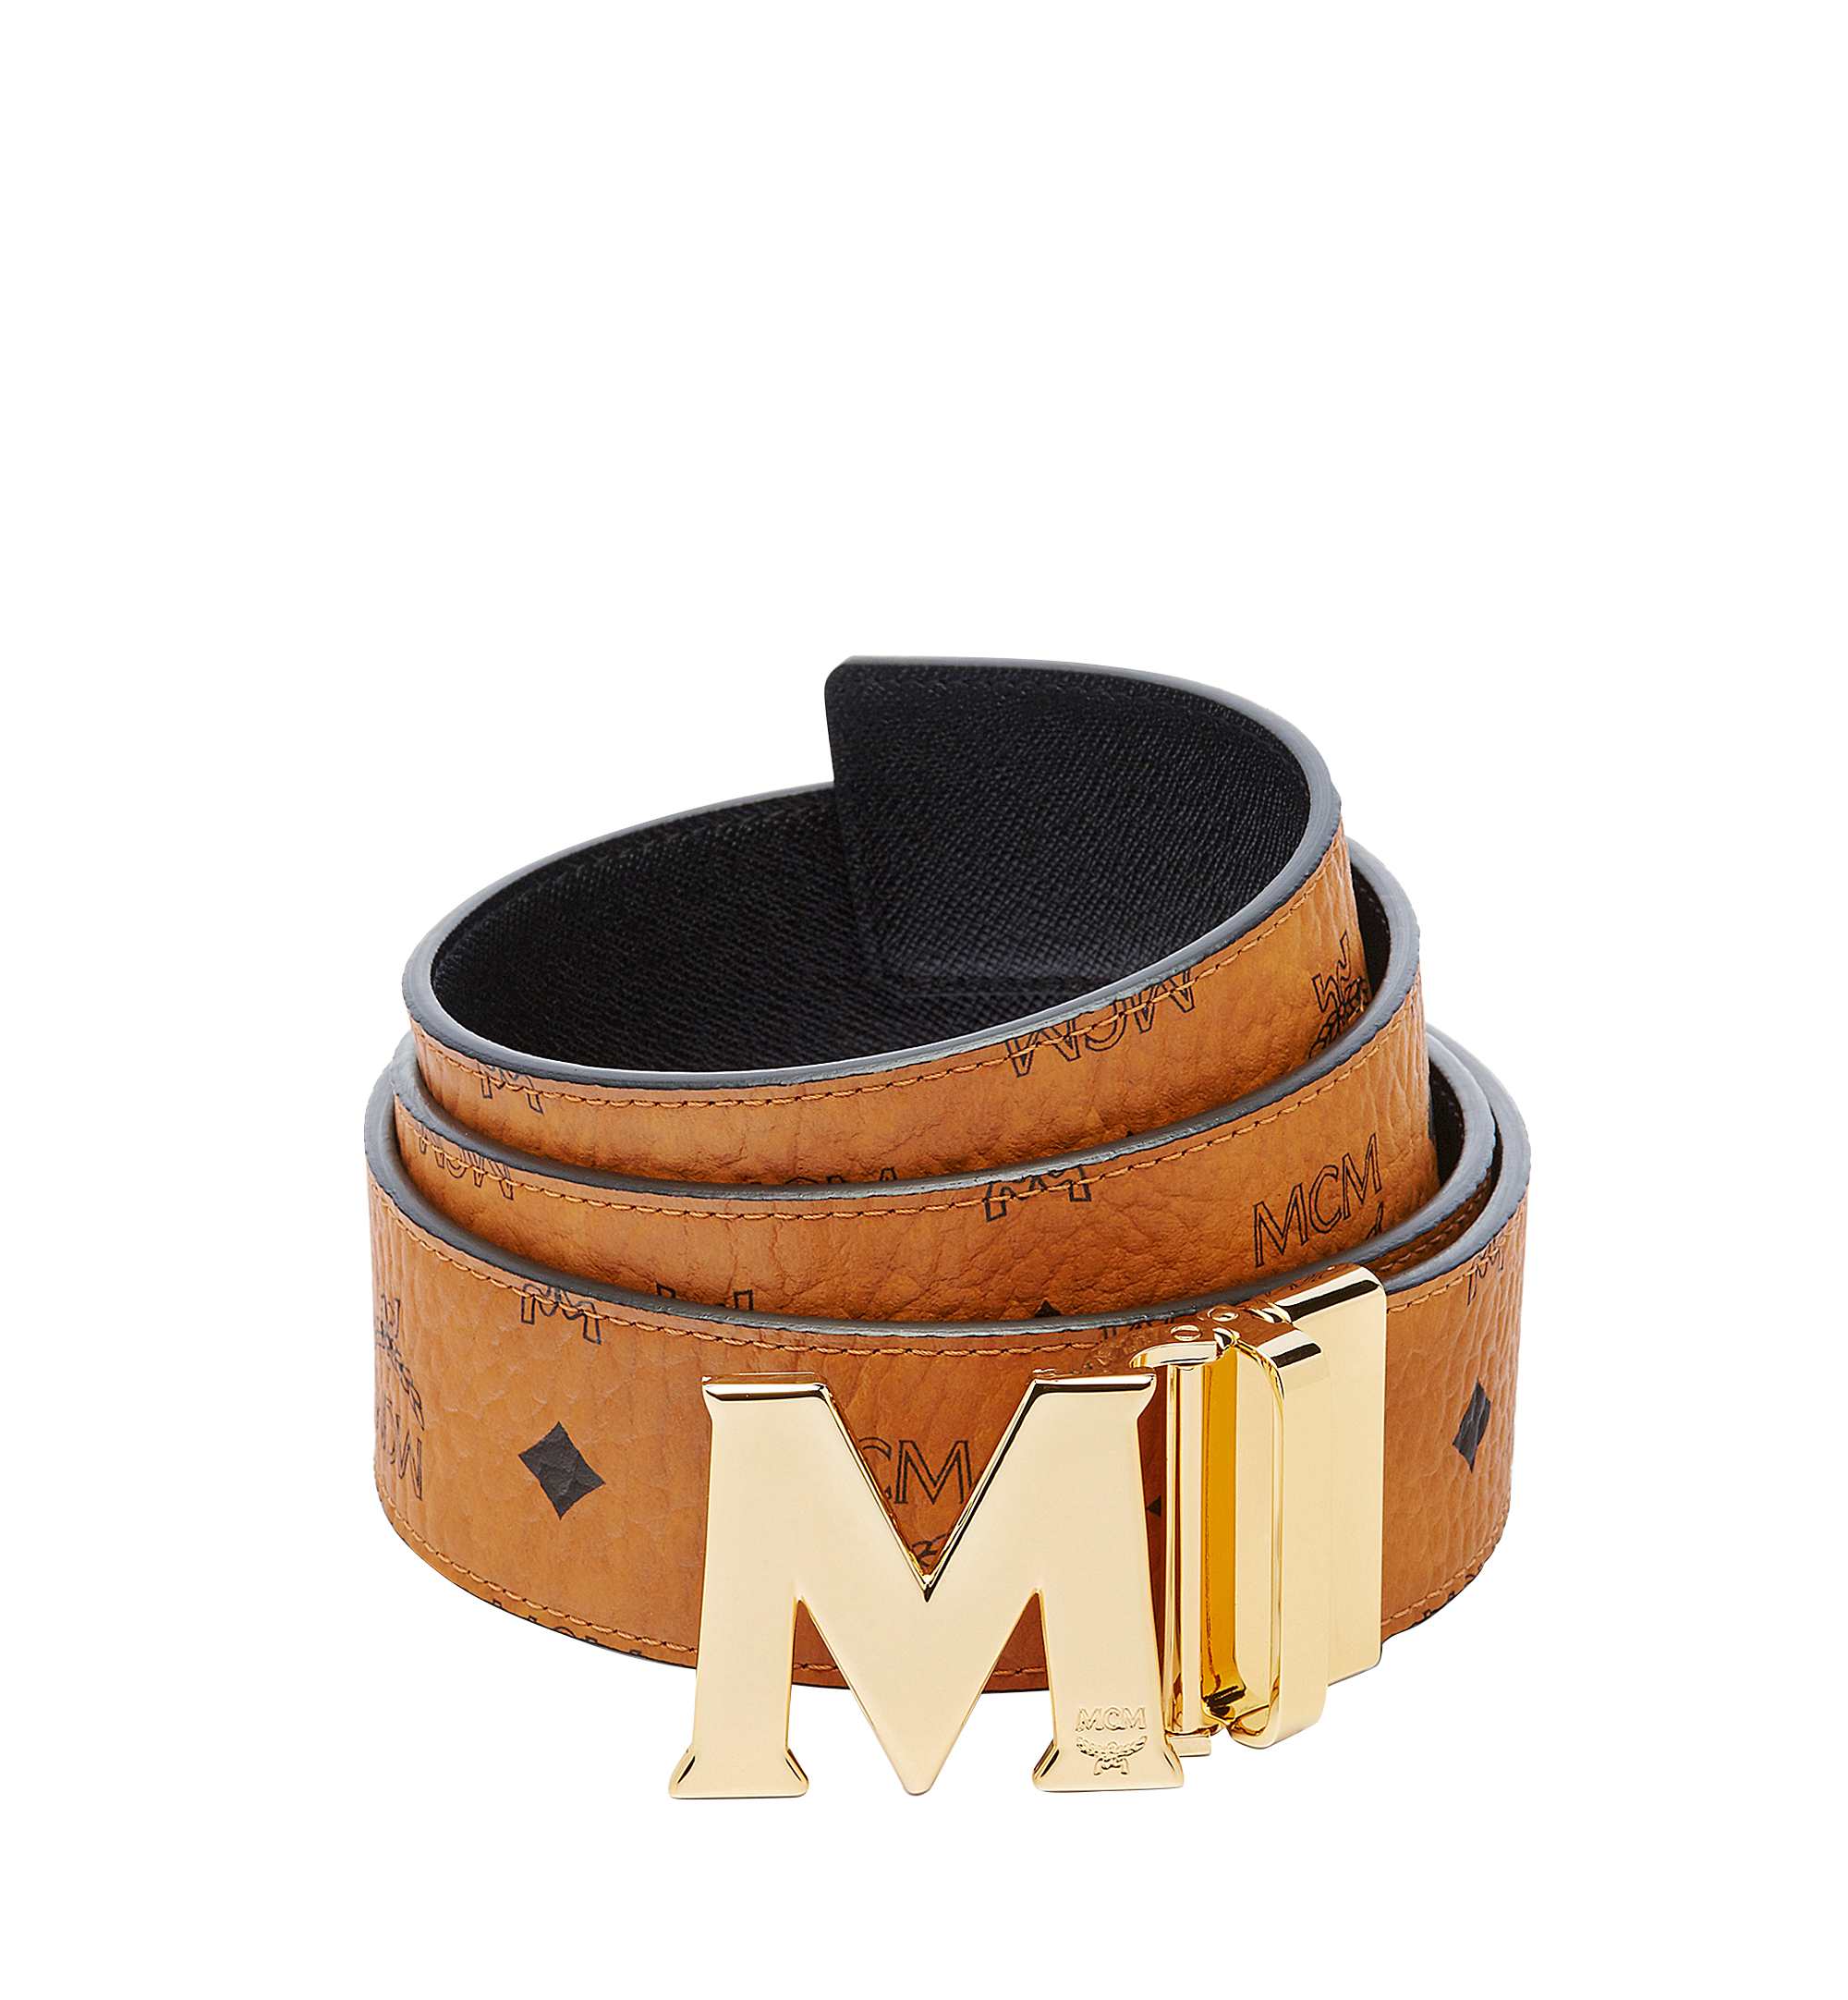 "MCM Claus M Reversible Belt 1.75"" in Visetos Cognac MXBAAVI03CO001 Alternate View 1"